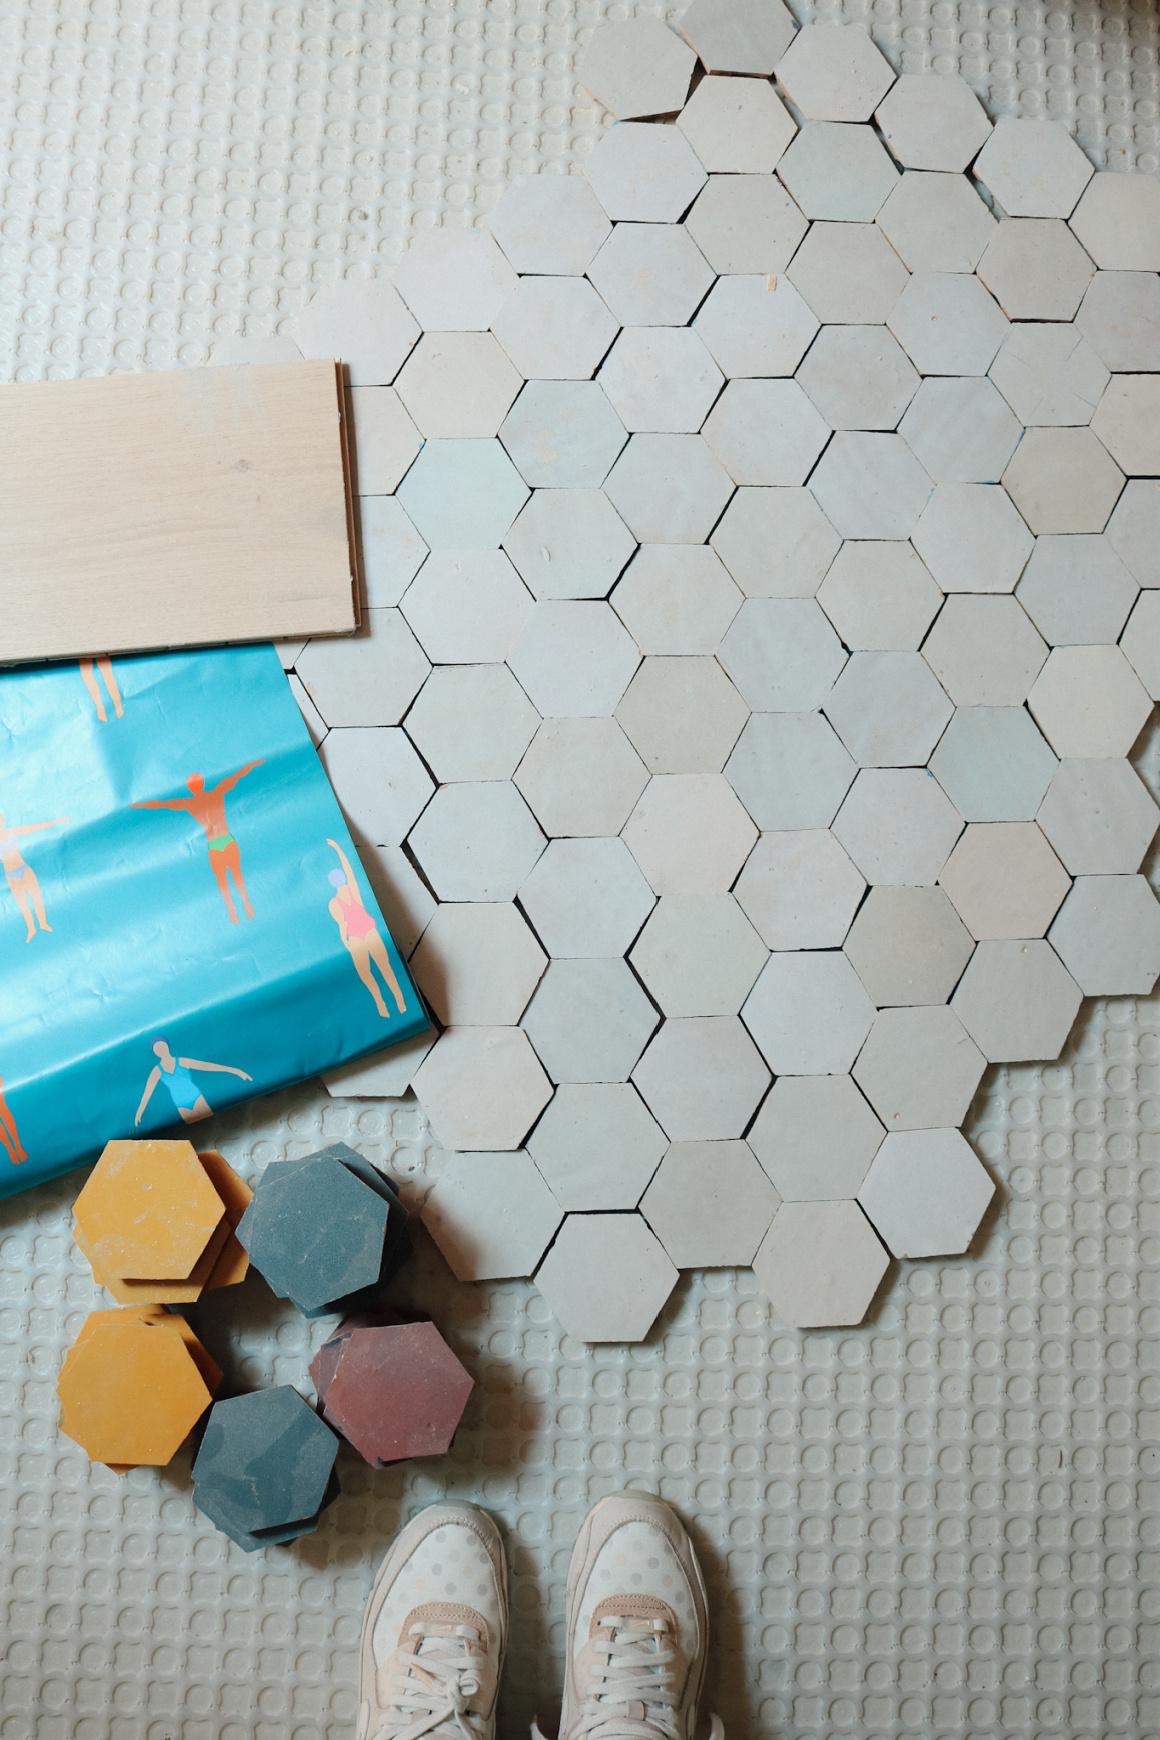 Our Tile! Help us Pick a Pattern terracotta tile Fun tile colorful tile